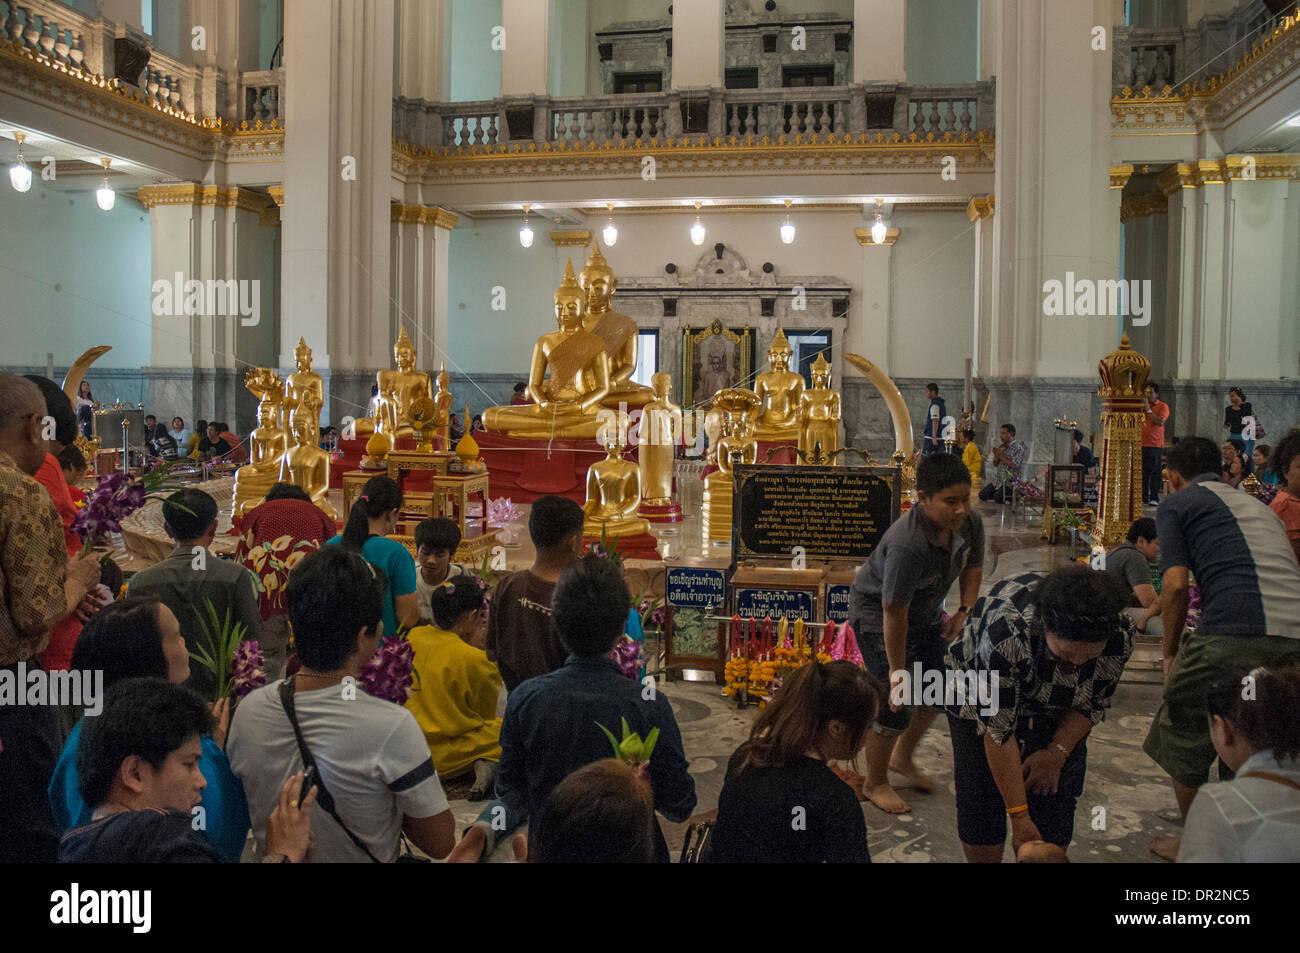 Inside Wat Sothon Wararam Woraviharn at Chachoengsao, Thailand - Stock Image